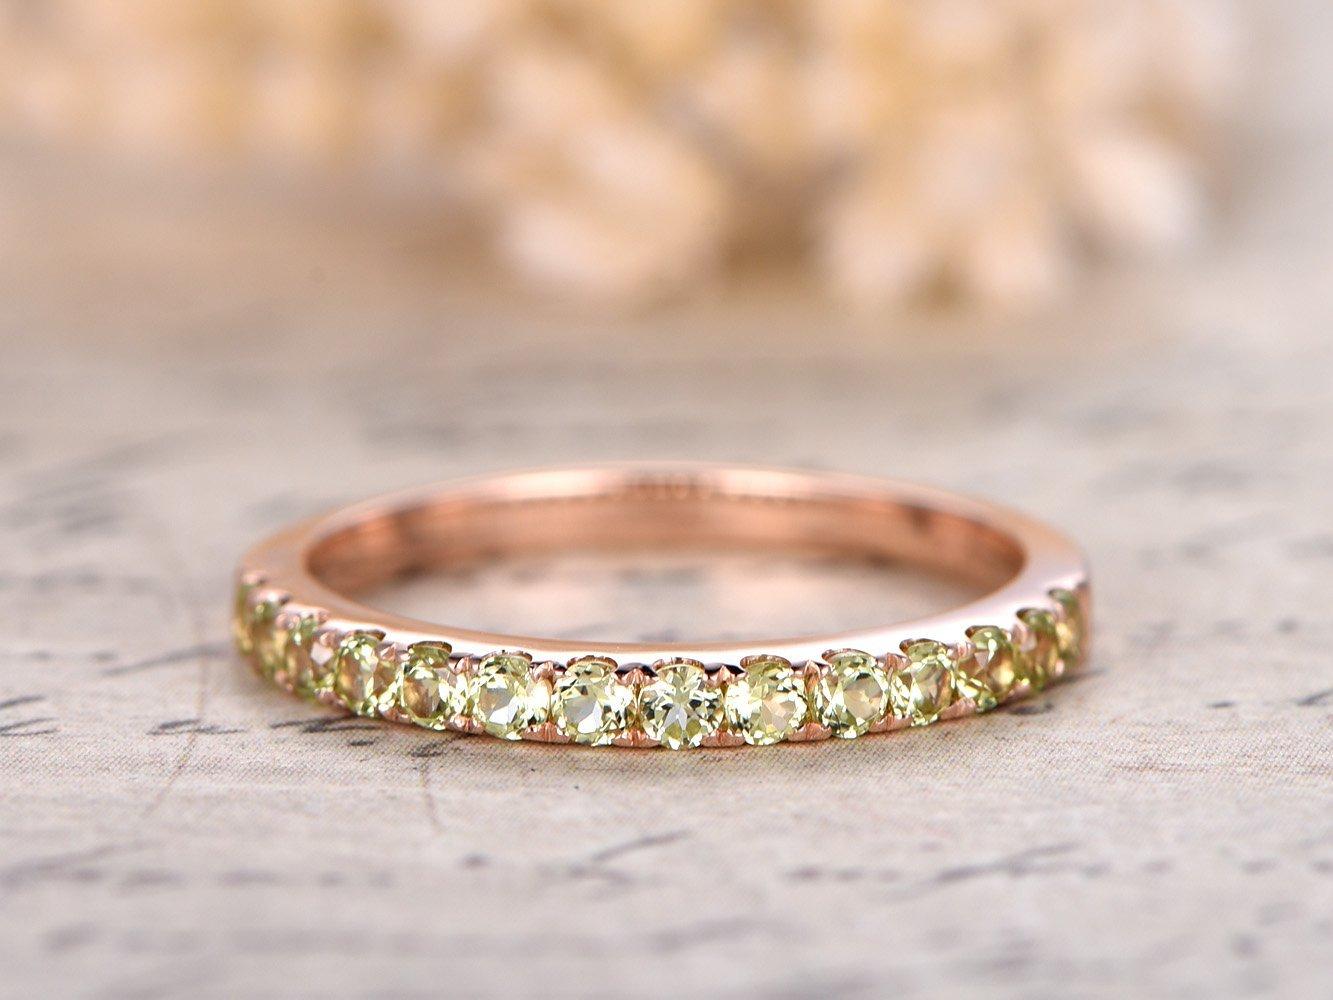 Solid 14k Rose Gold Half Eternity 2mm Round Cut Natural VS Green Peridot Bridal Wedding Propose Stacking Matching Band Size 4-9